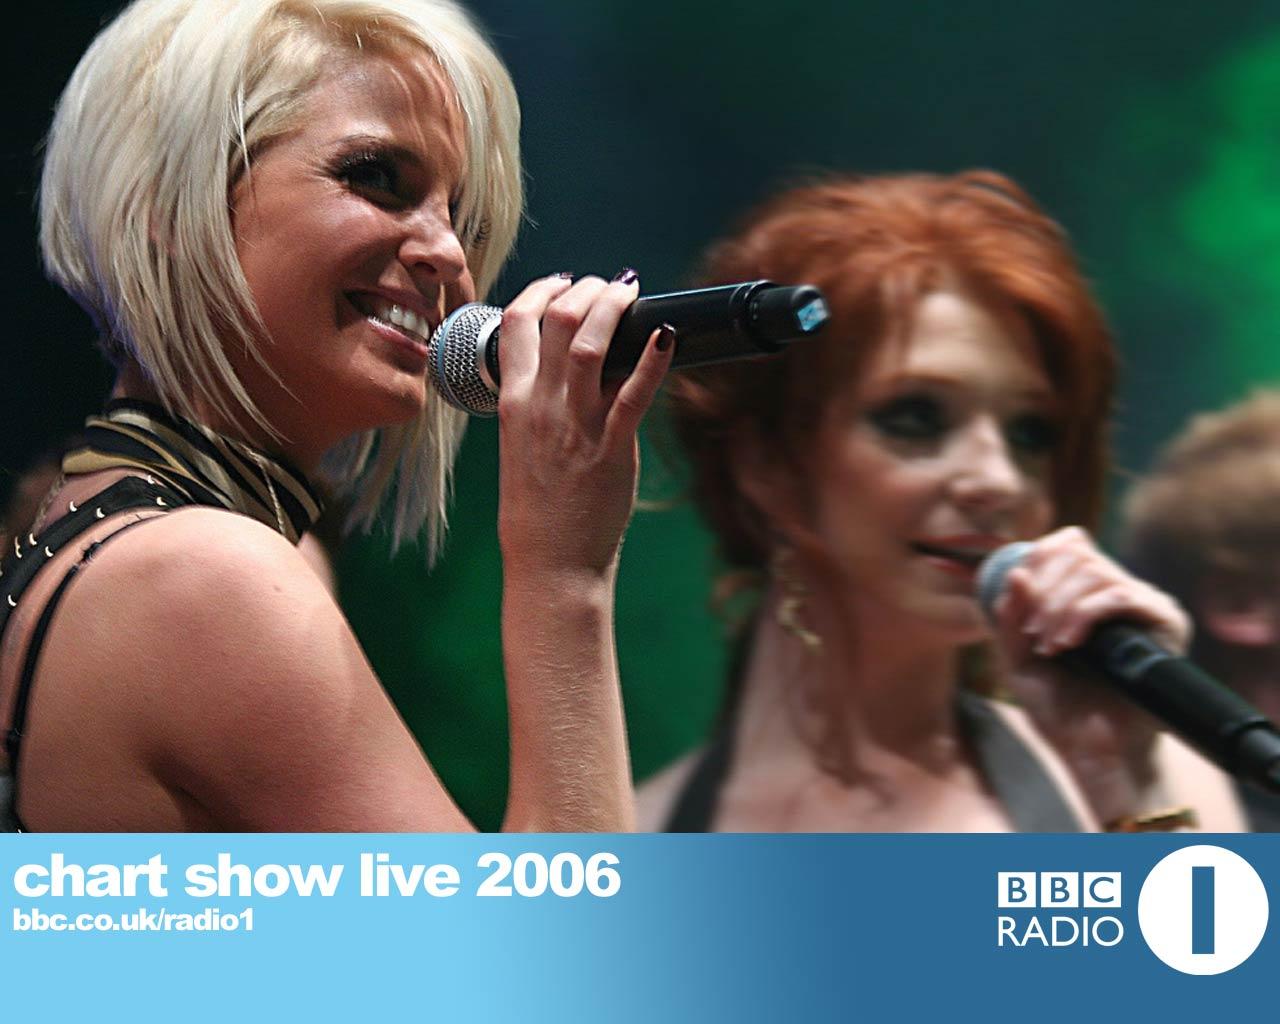 BBC - Radio 1 - Chart Show Live 2006